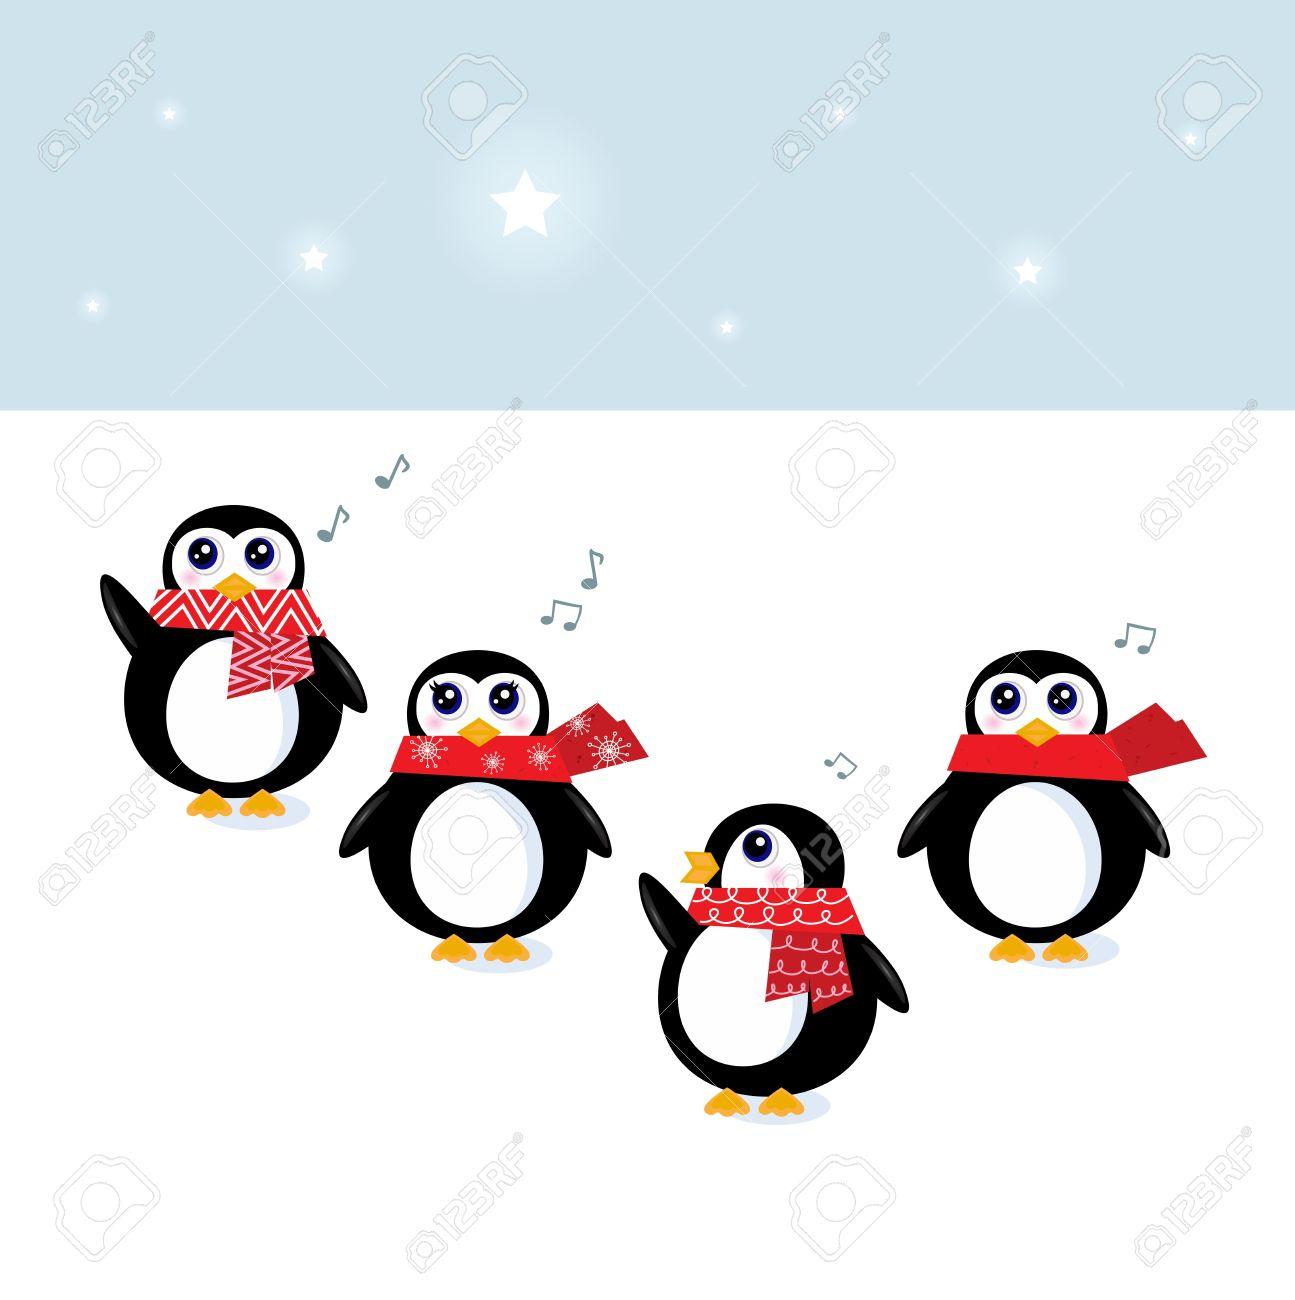 Cute Penguins Singing Christmas Song. Vector Illustration Royalty ...